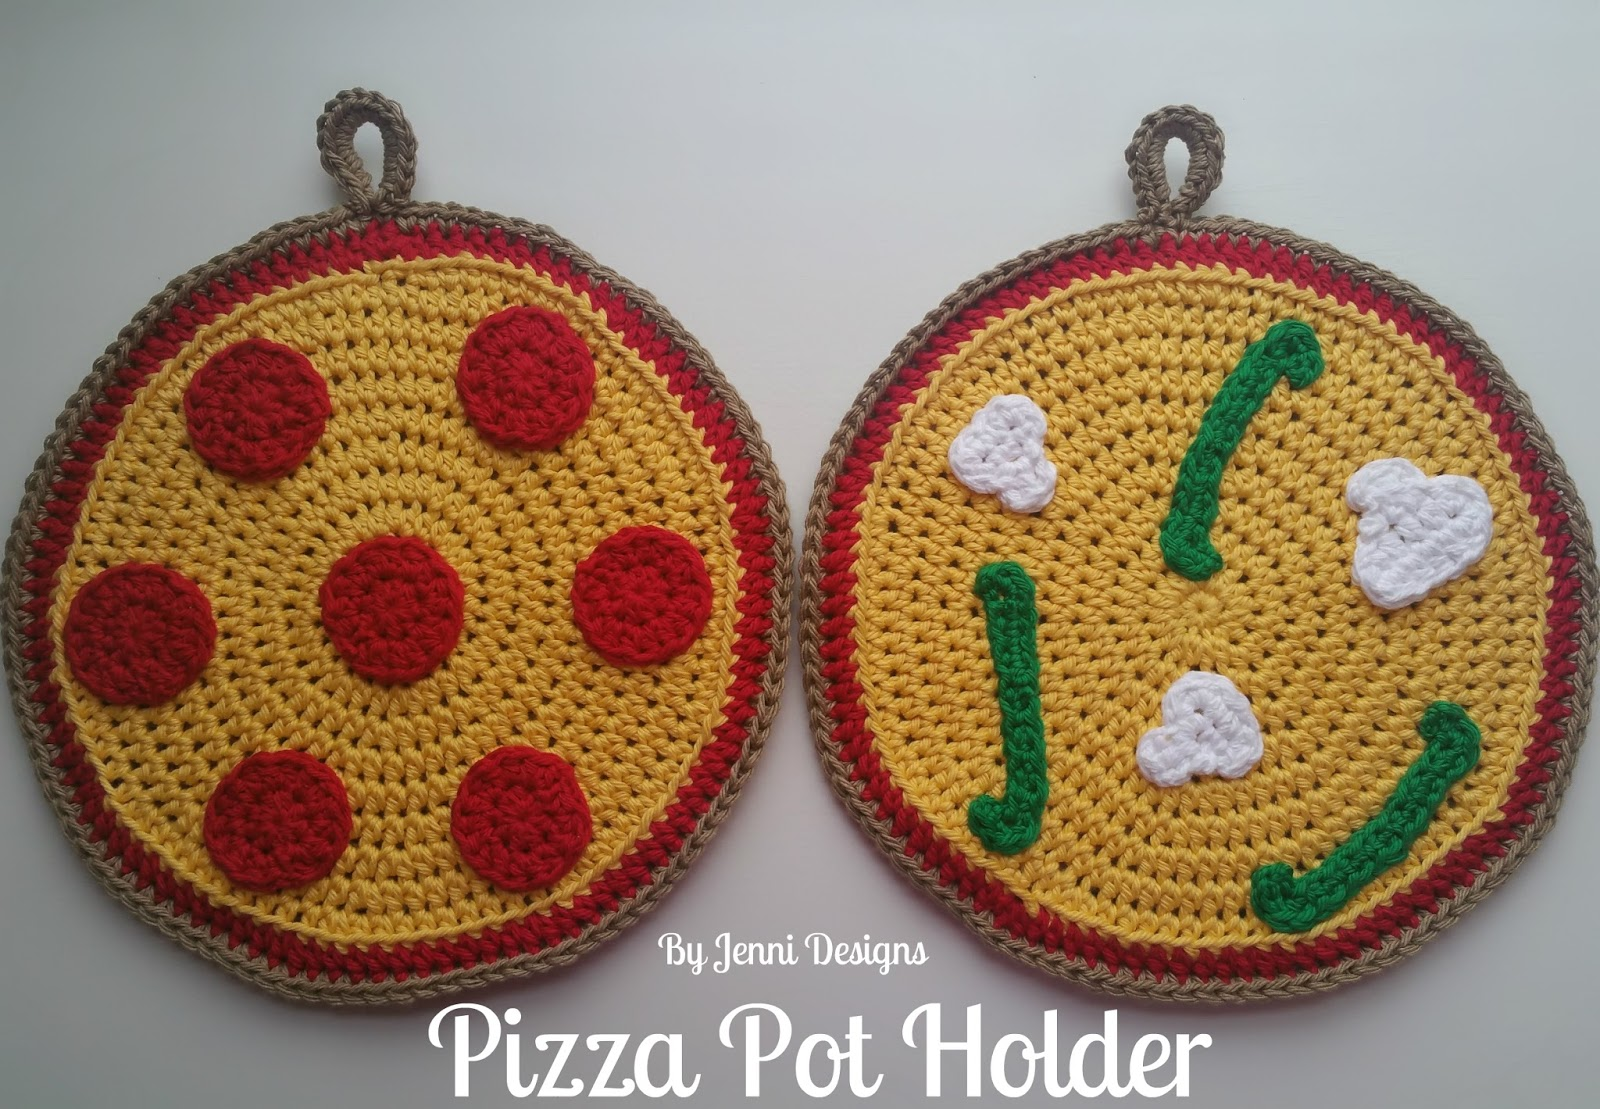 By Jenni Designs: Free Crochet Pattern: Pizza Pot Holder